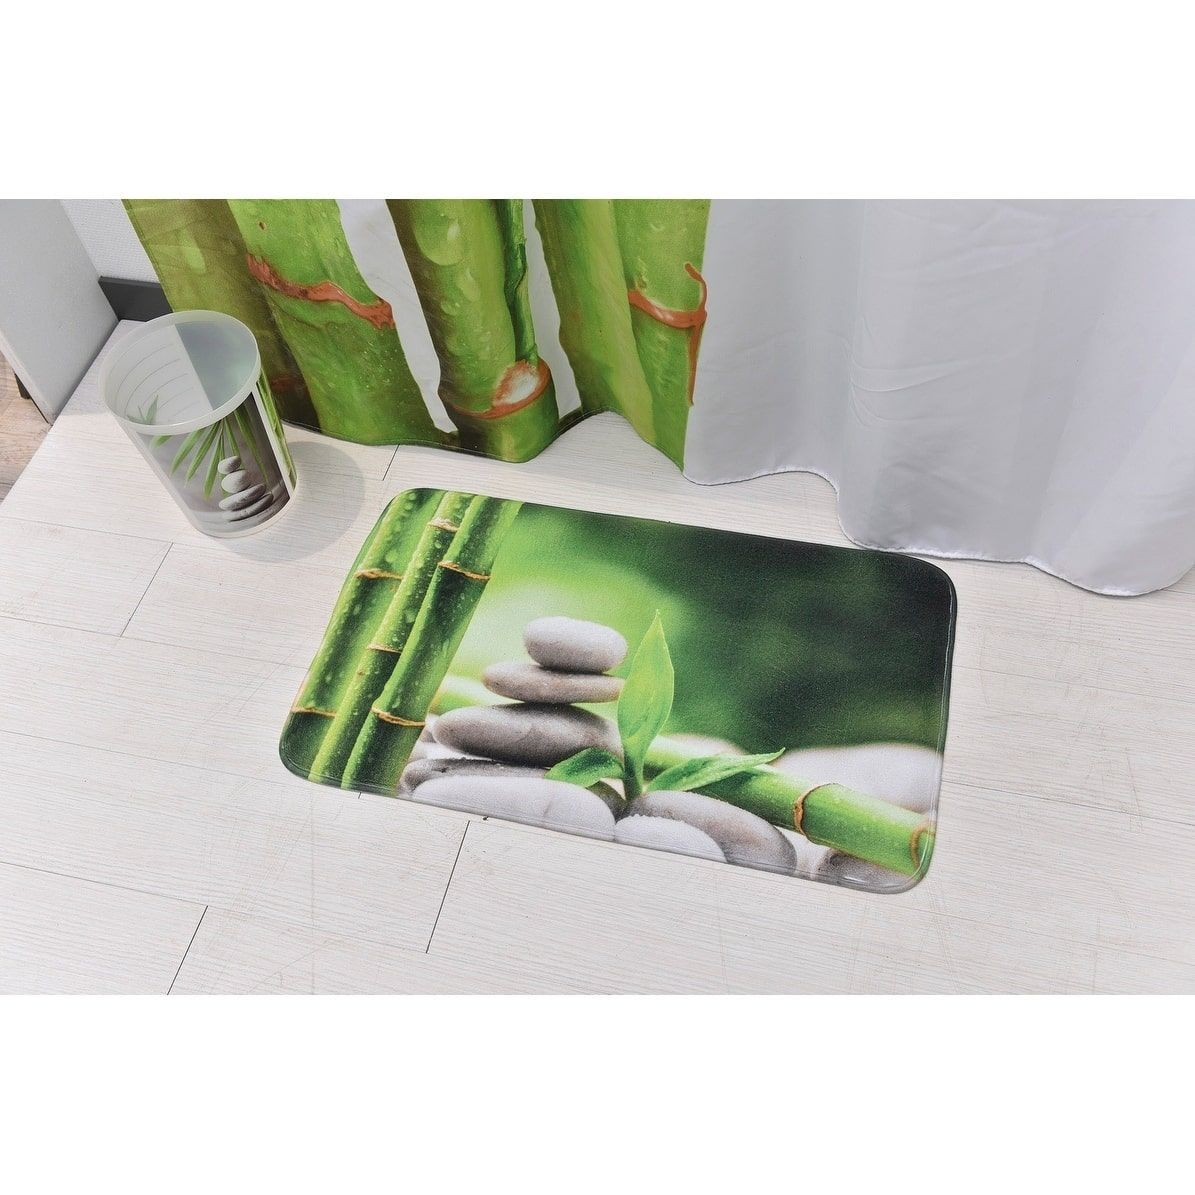 set paradise foam mat home amazon chesapeake com dp bath sage merchandising kitchen green mats memory s piece rug